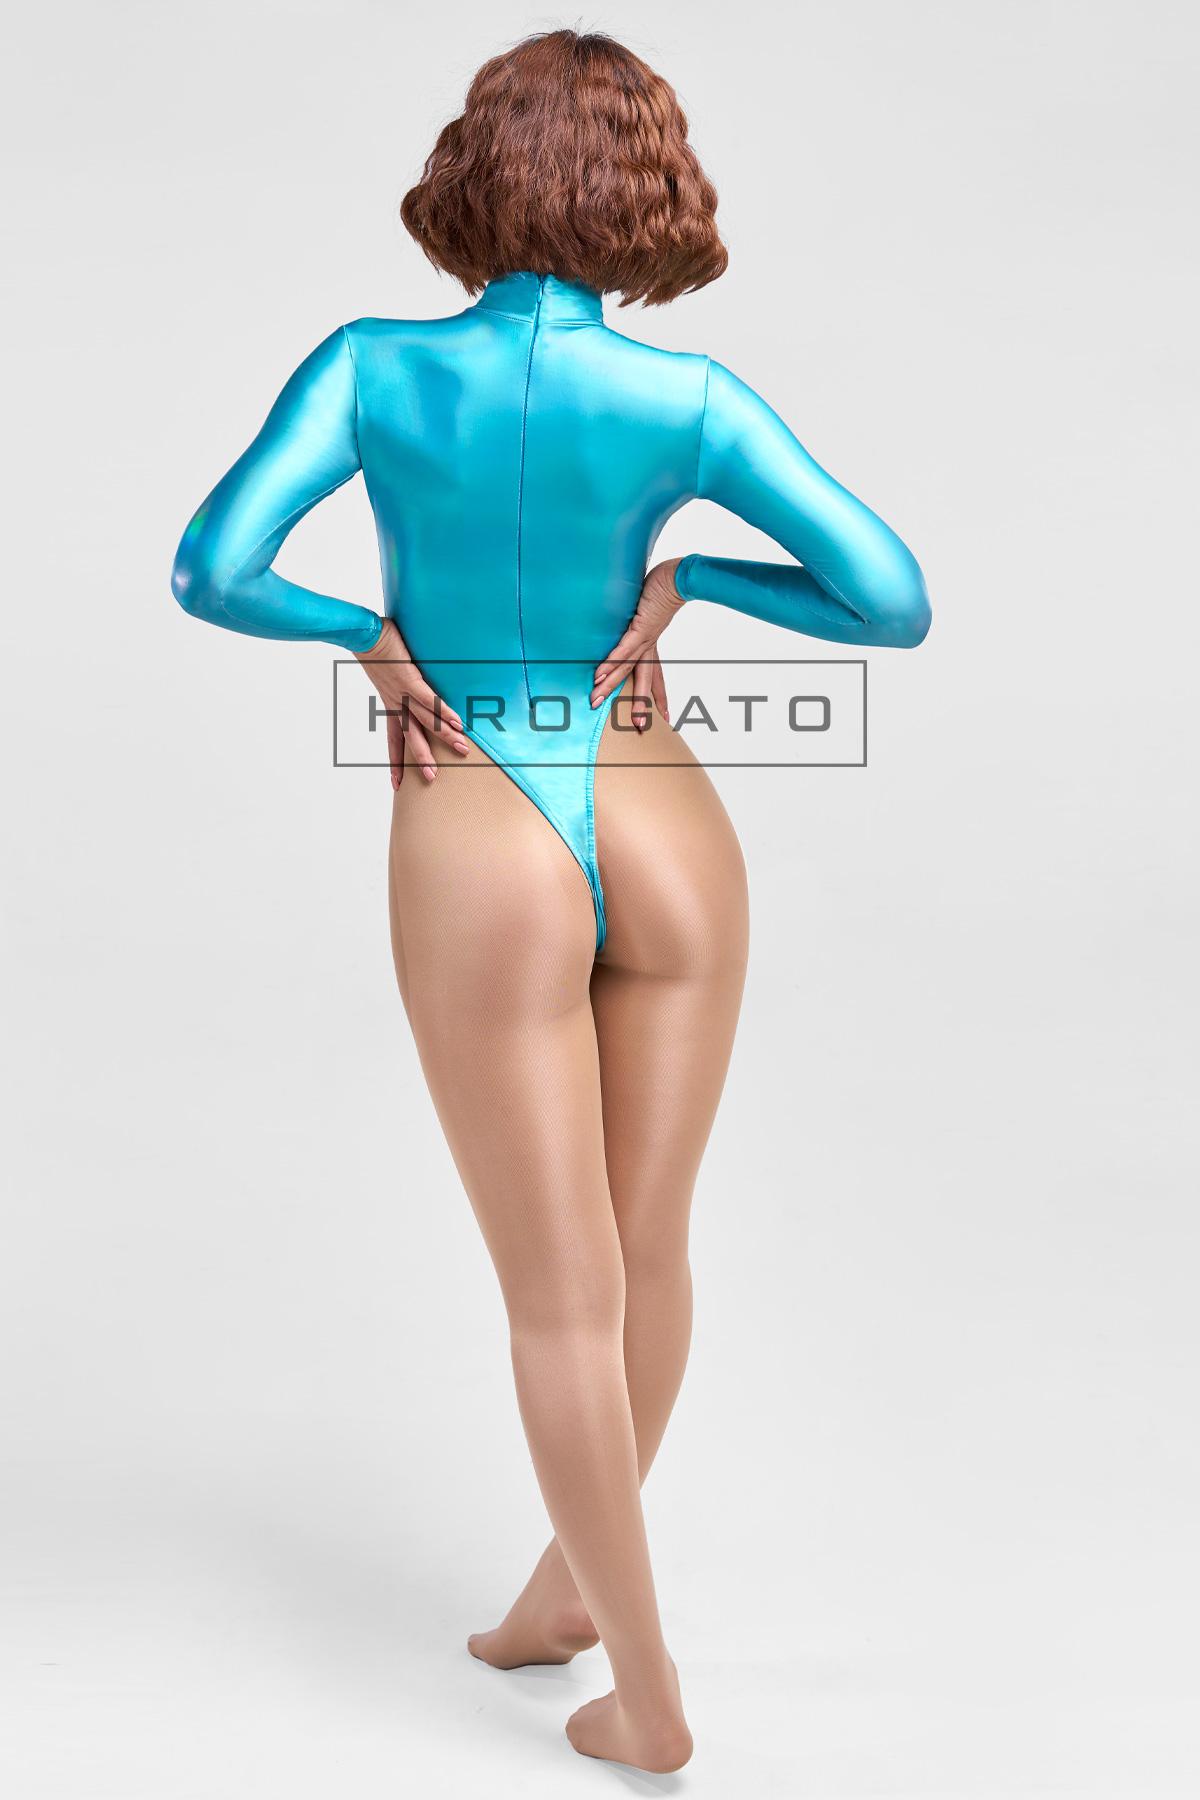 Shiny Metallic Hologram Leotard Skyblue High Leg Spandex Lycra Body Swimsuit